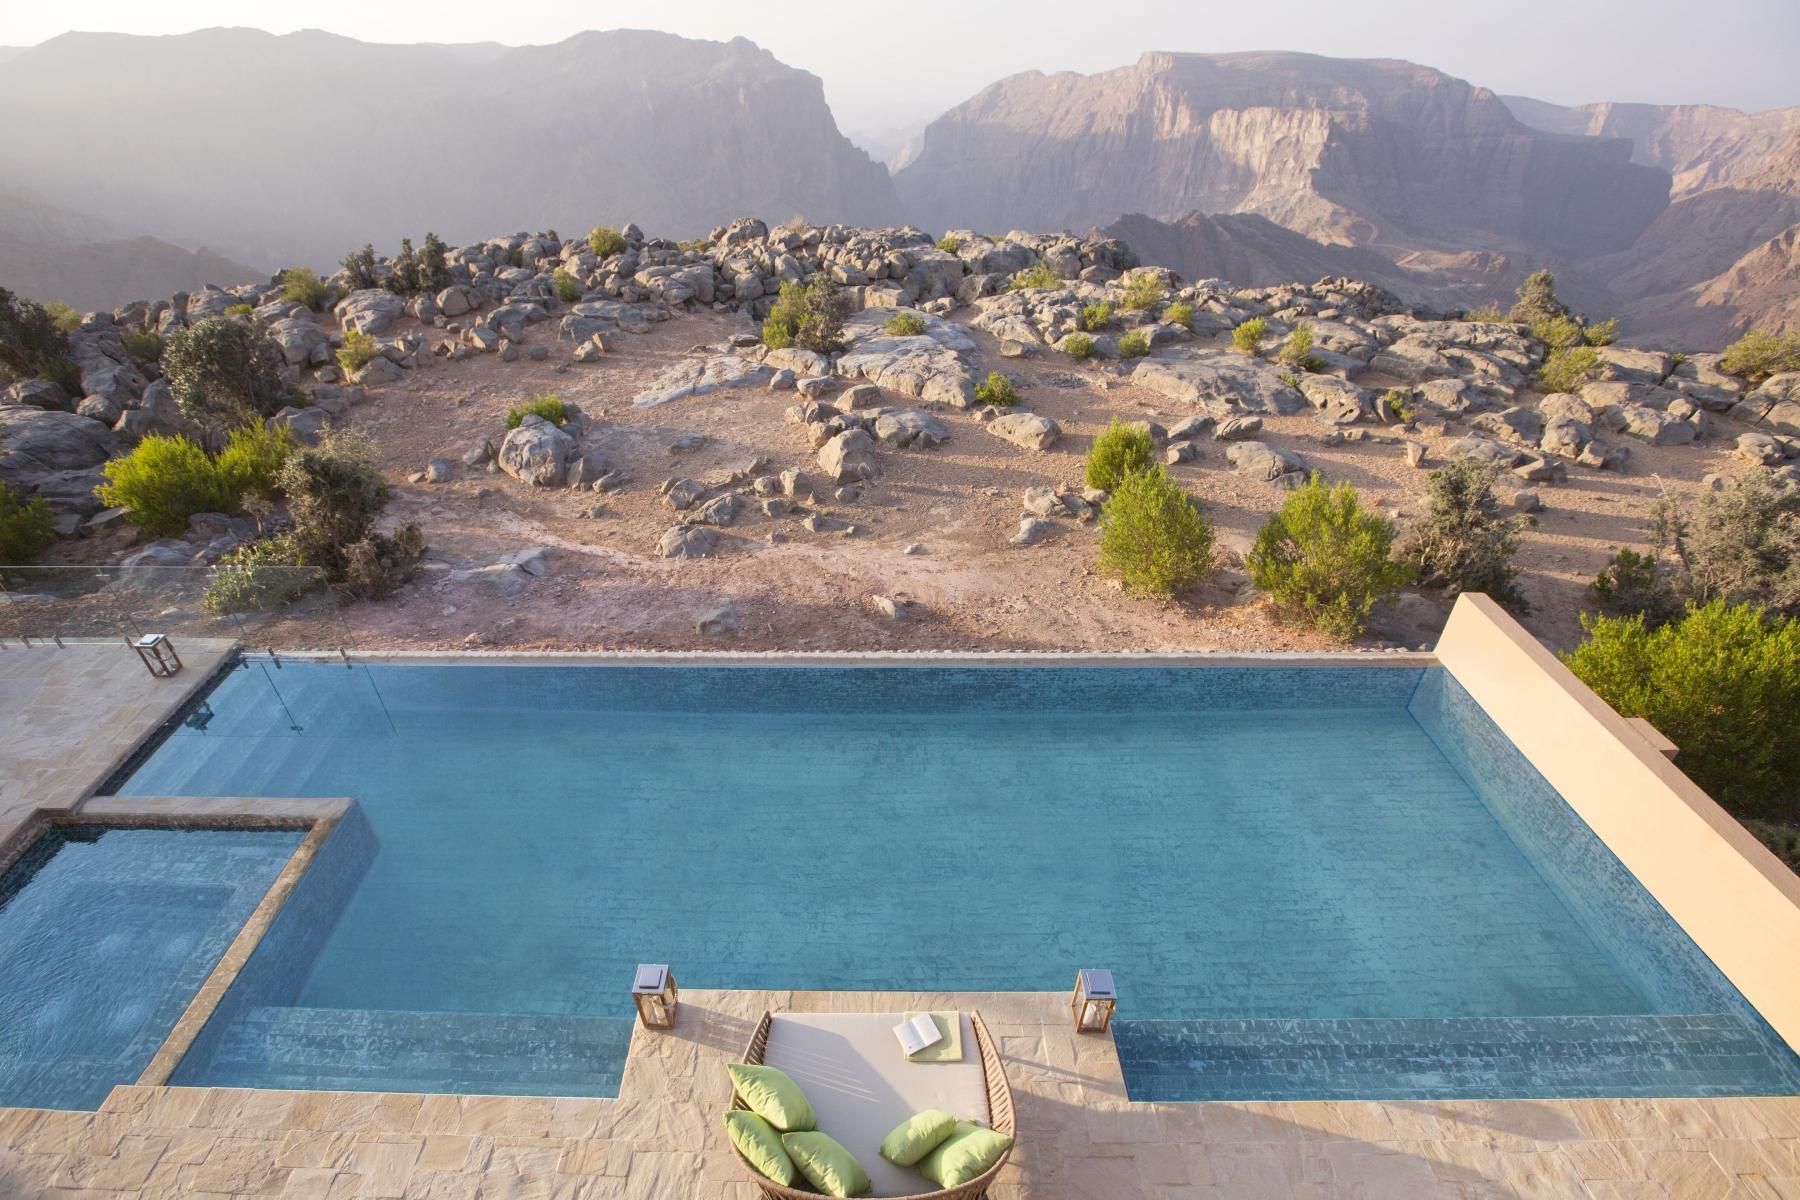 Anantara-Al-Jabal-Al-Akhdar-Resort-Royal-Mountain-Villa-Pool-02-min